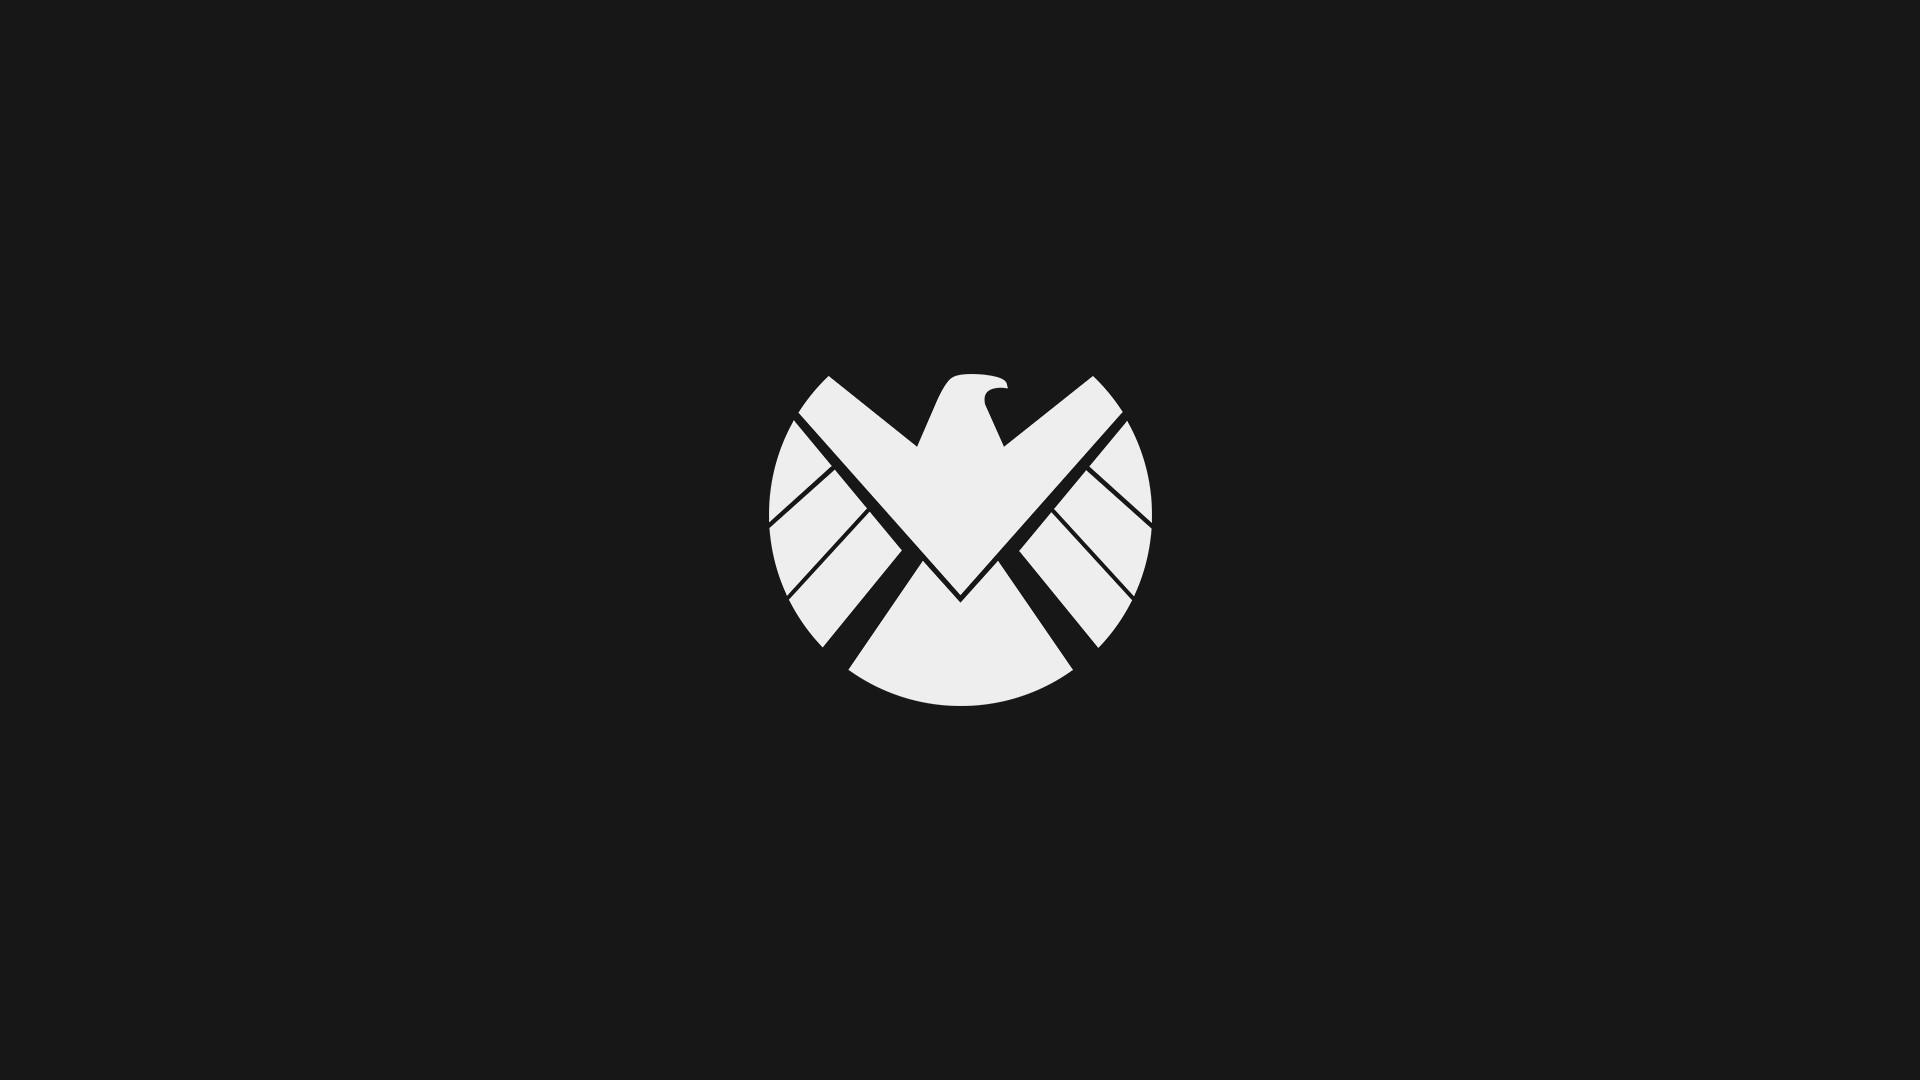 Agents Of S.H.I.E.L.D. Marvel Cinematic Universe S.H.